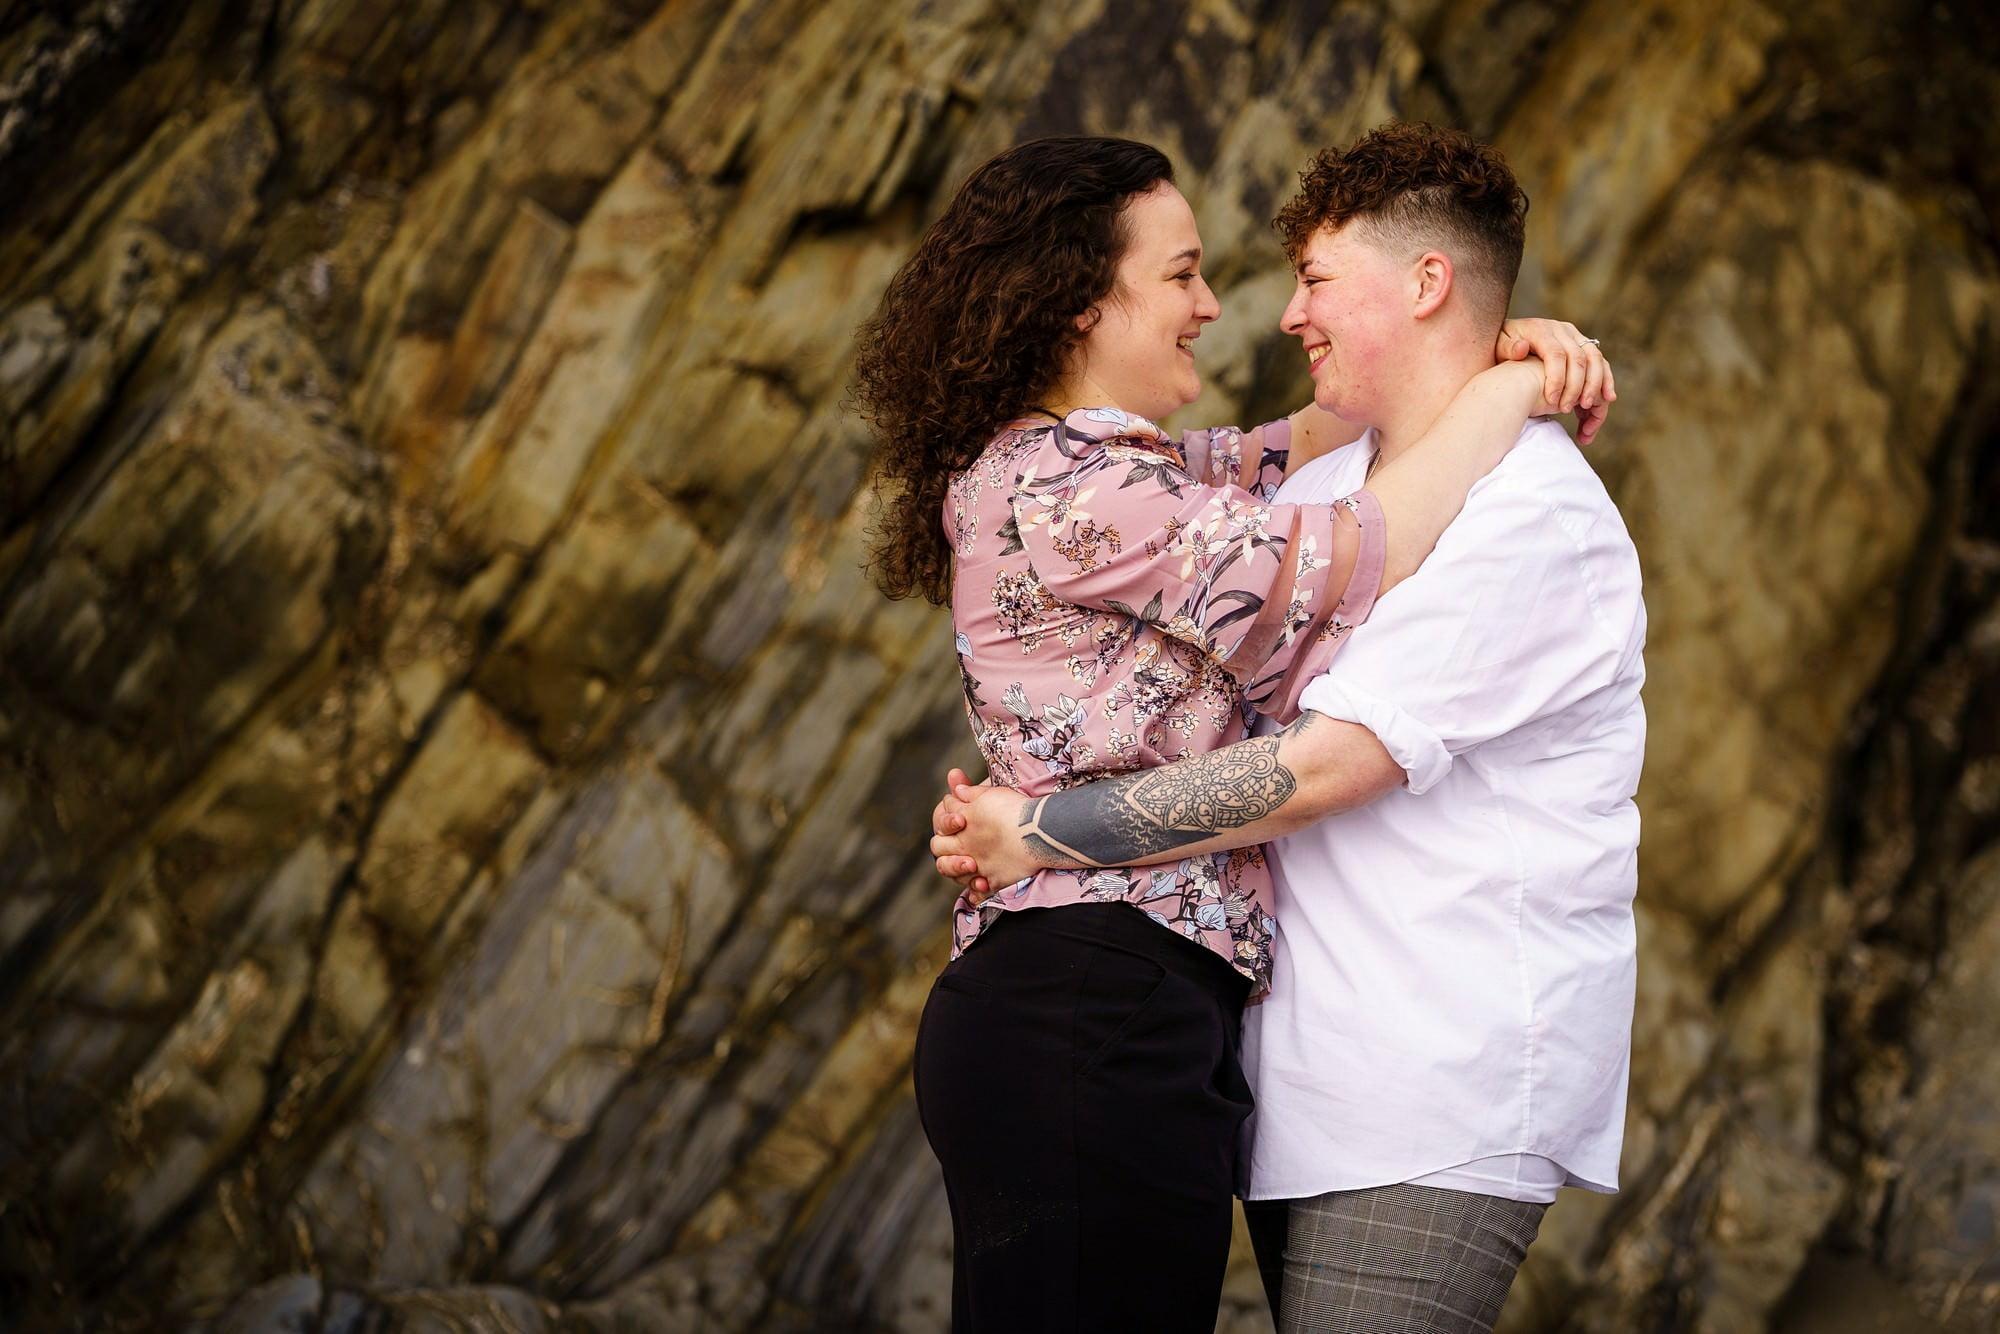 Lesbian wedding proposal in Cornwall